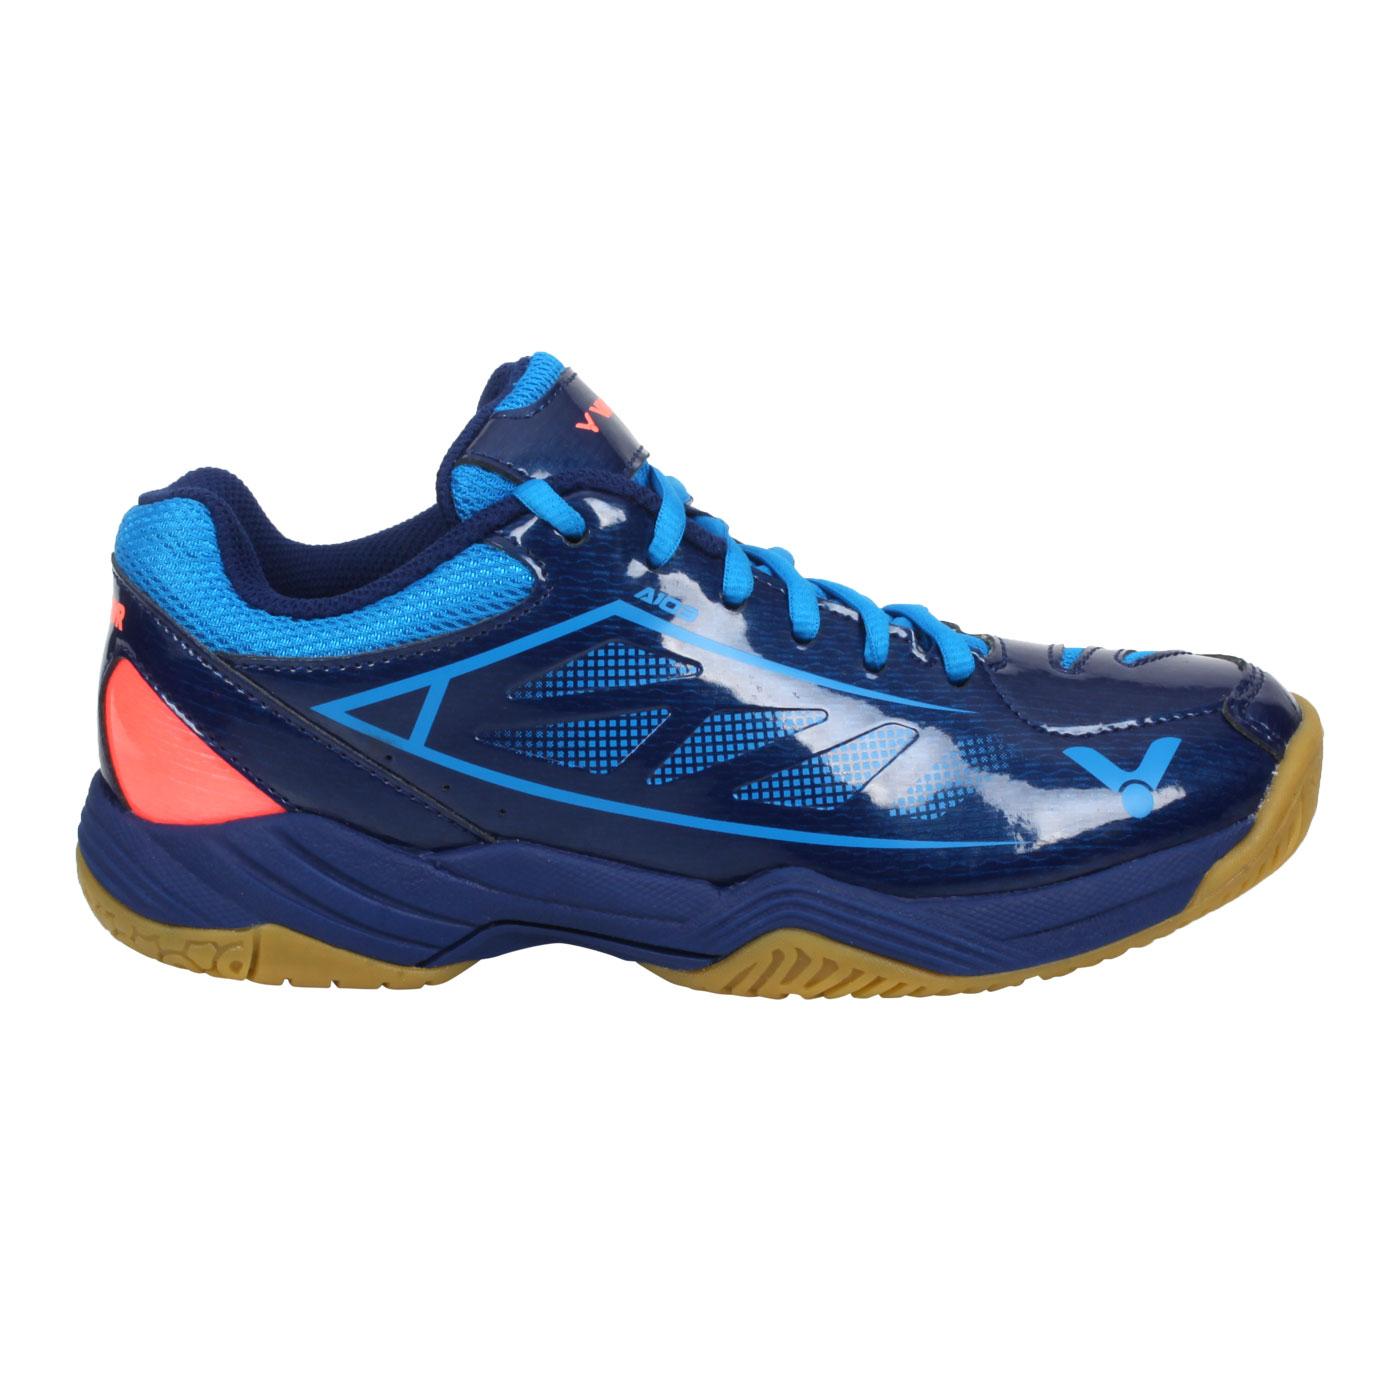 VICTOR 羽球鞋 A103-BF - 丈青藍橘